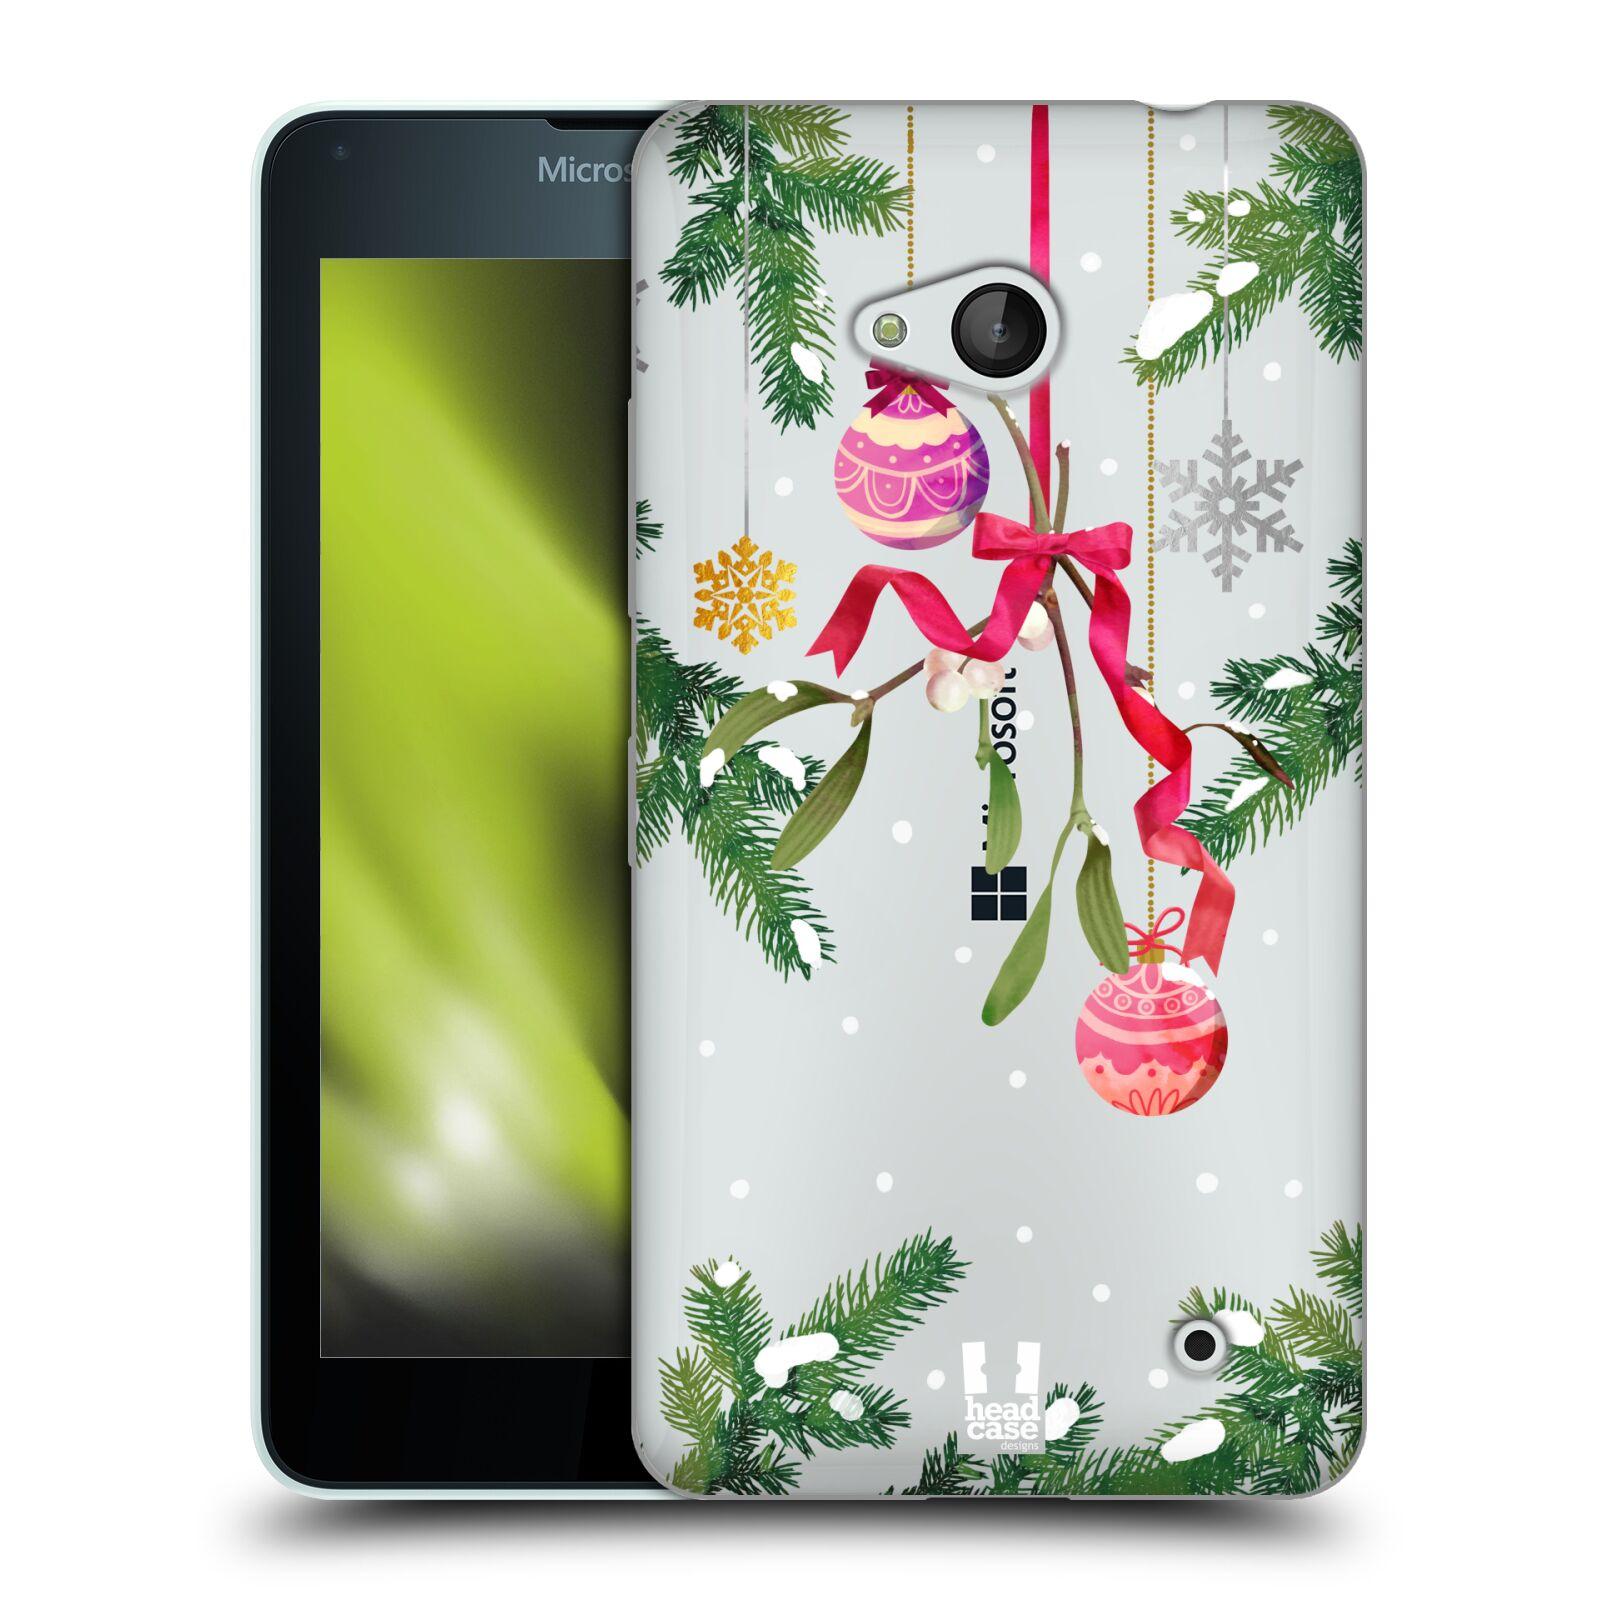 Silikonové pouzdro na mobil Microsoft Lumia 640 - Head Case - Větvičky a vánoční ozdoby